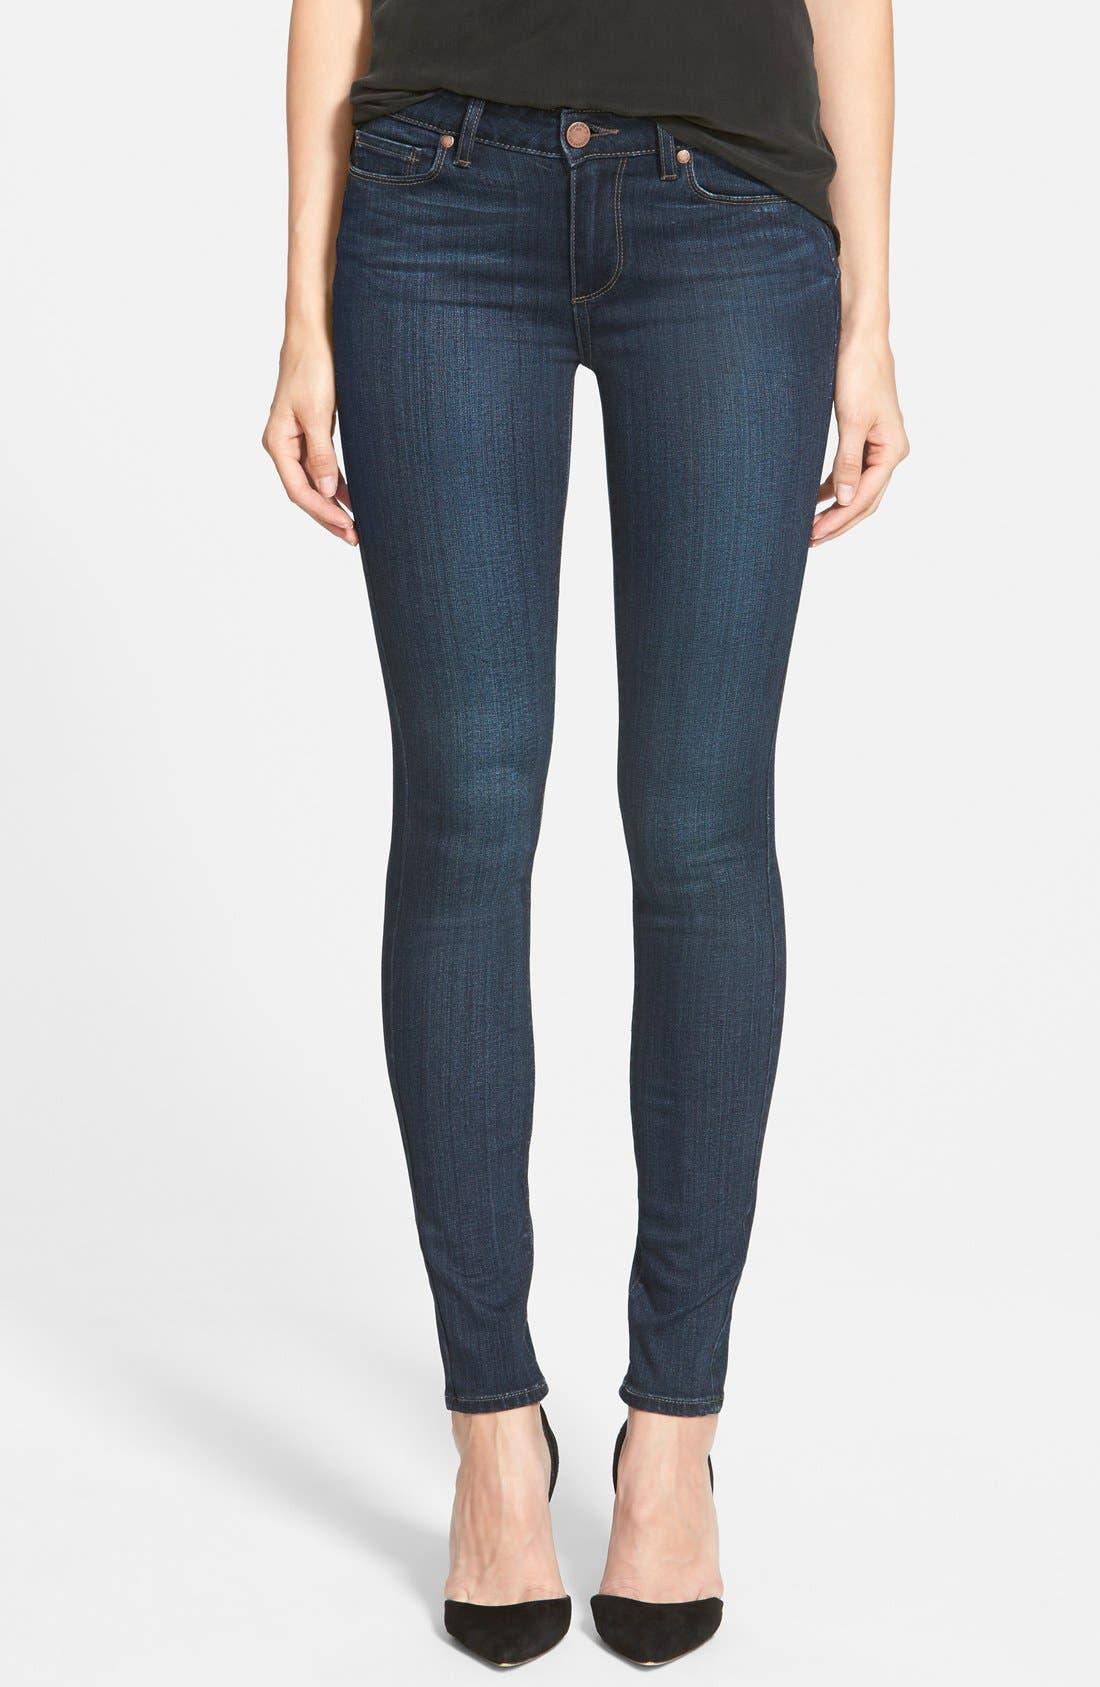 Alternate Image 1 Selected - PAIGE 'Transcend - Verdugo' Ultra Skinny Jeans (Clark)